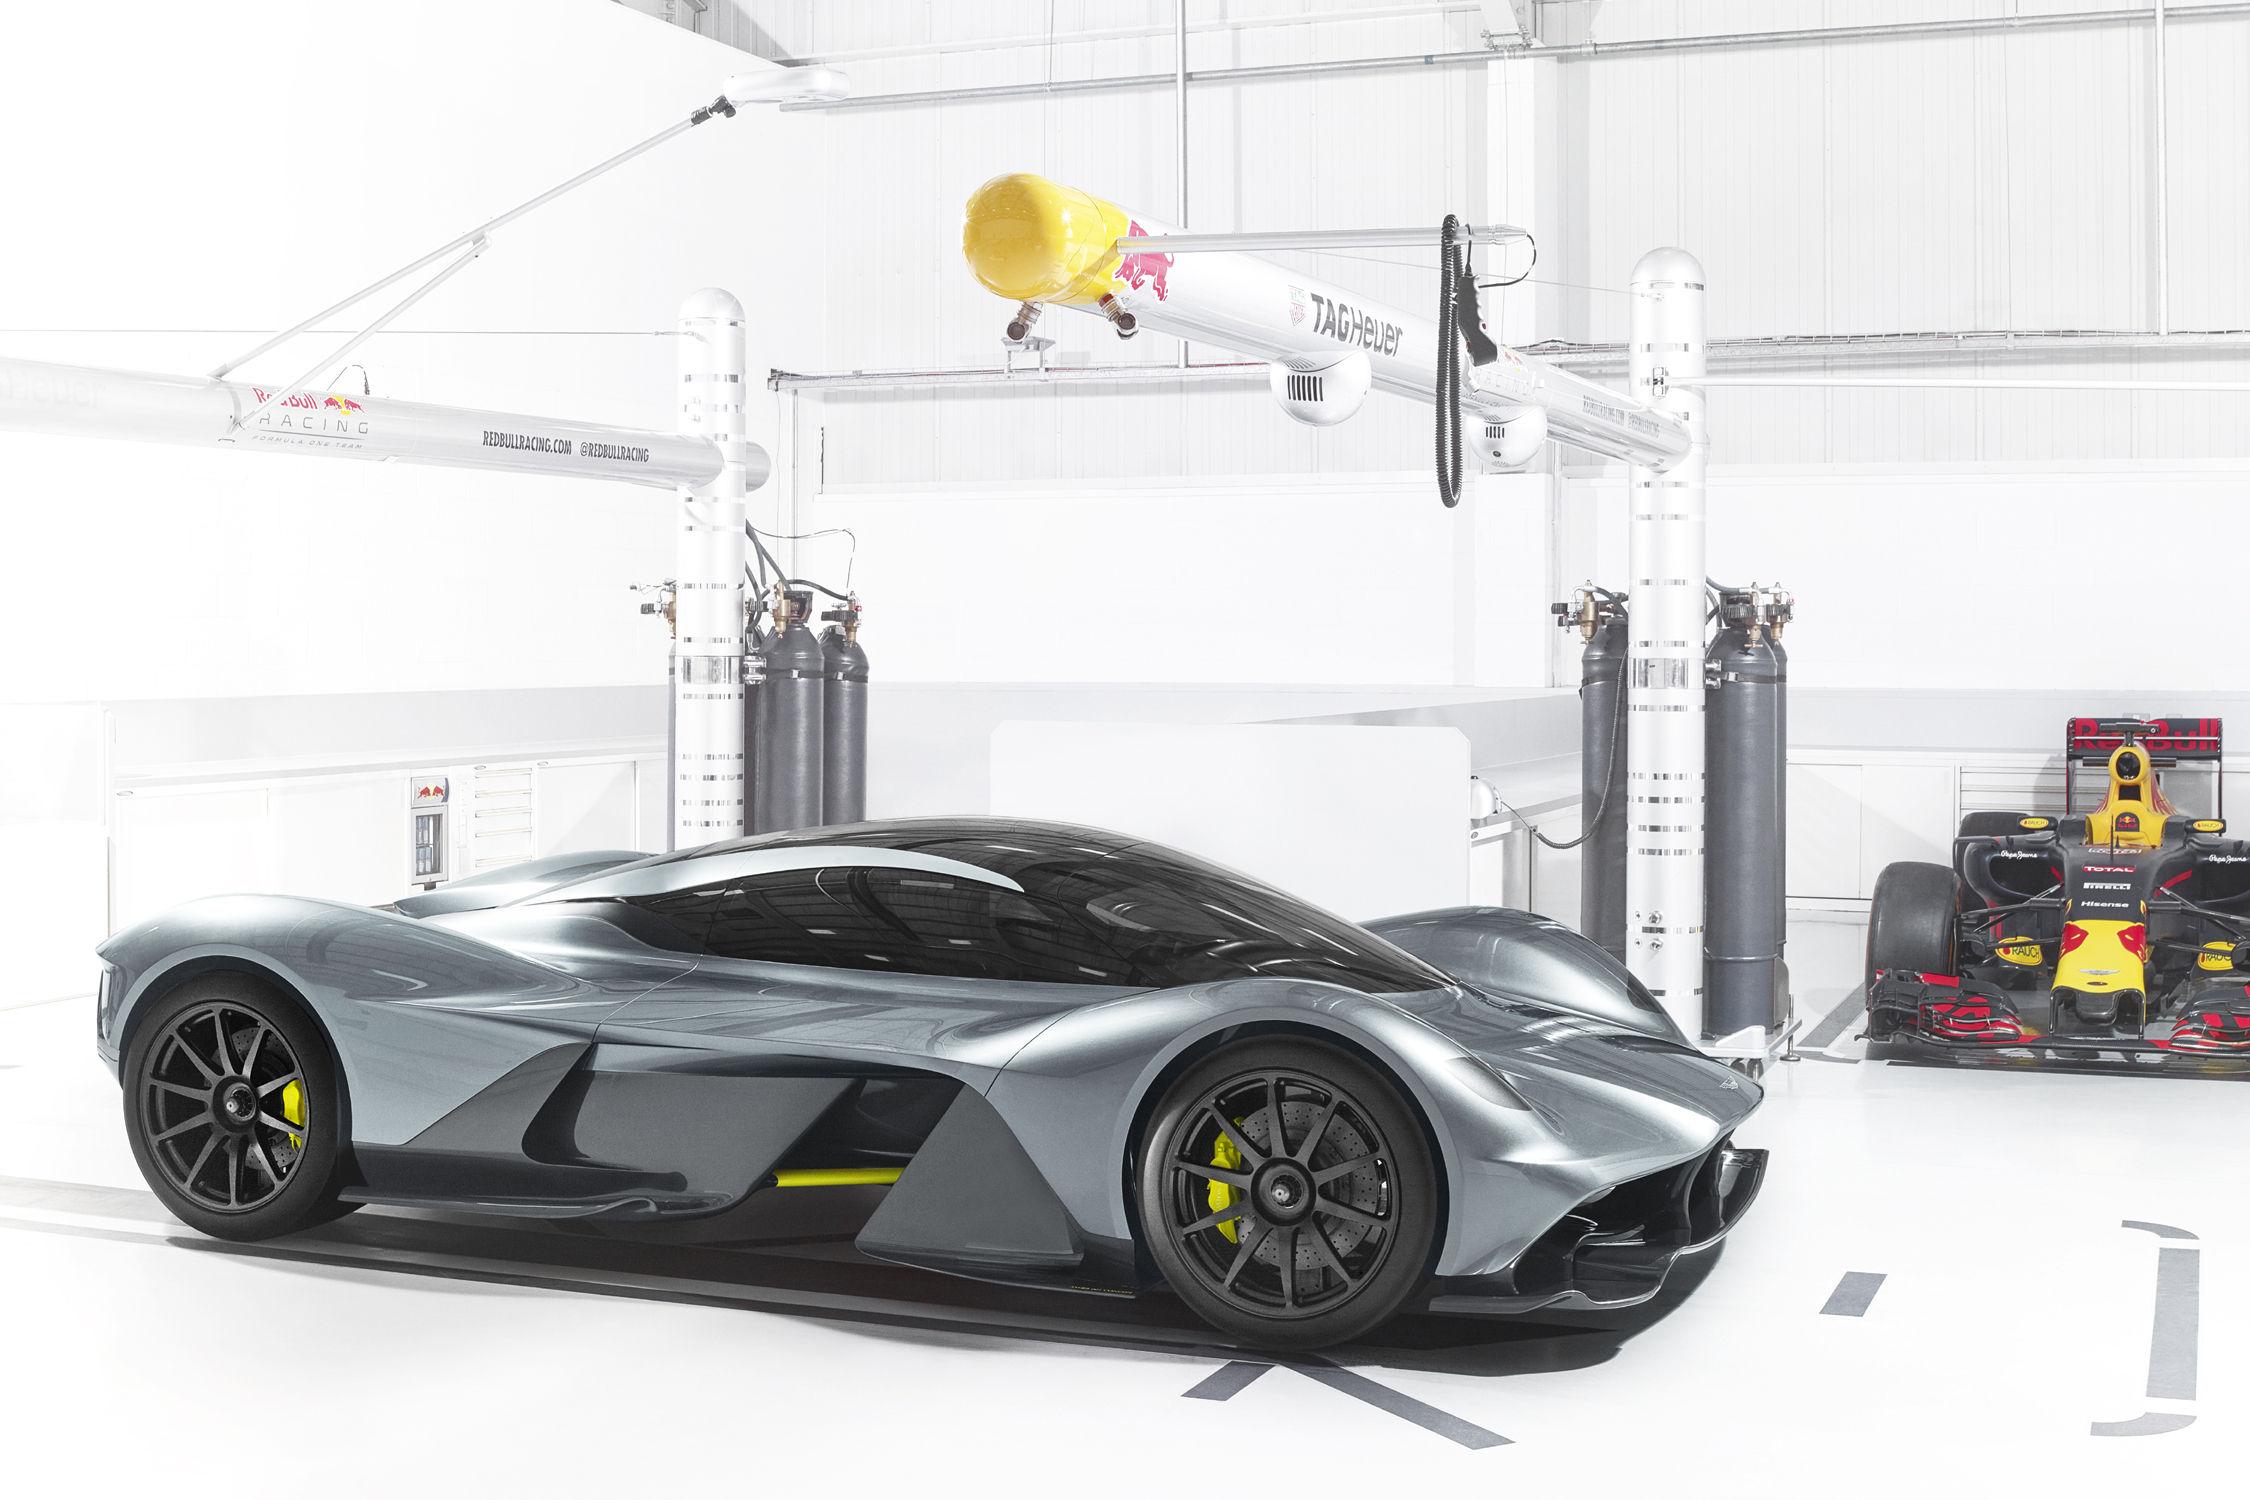 L'hypercar AM-RB 001 à un nom — Aston Martin Valkyrie